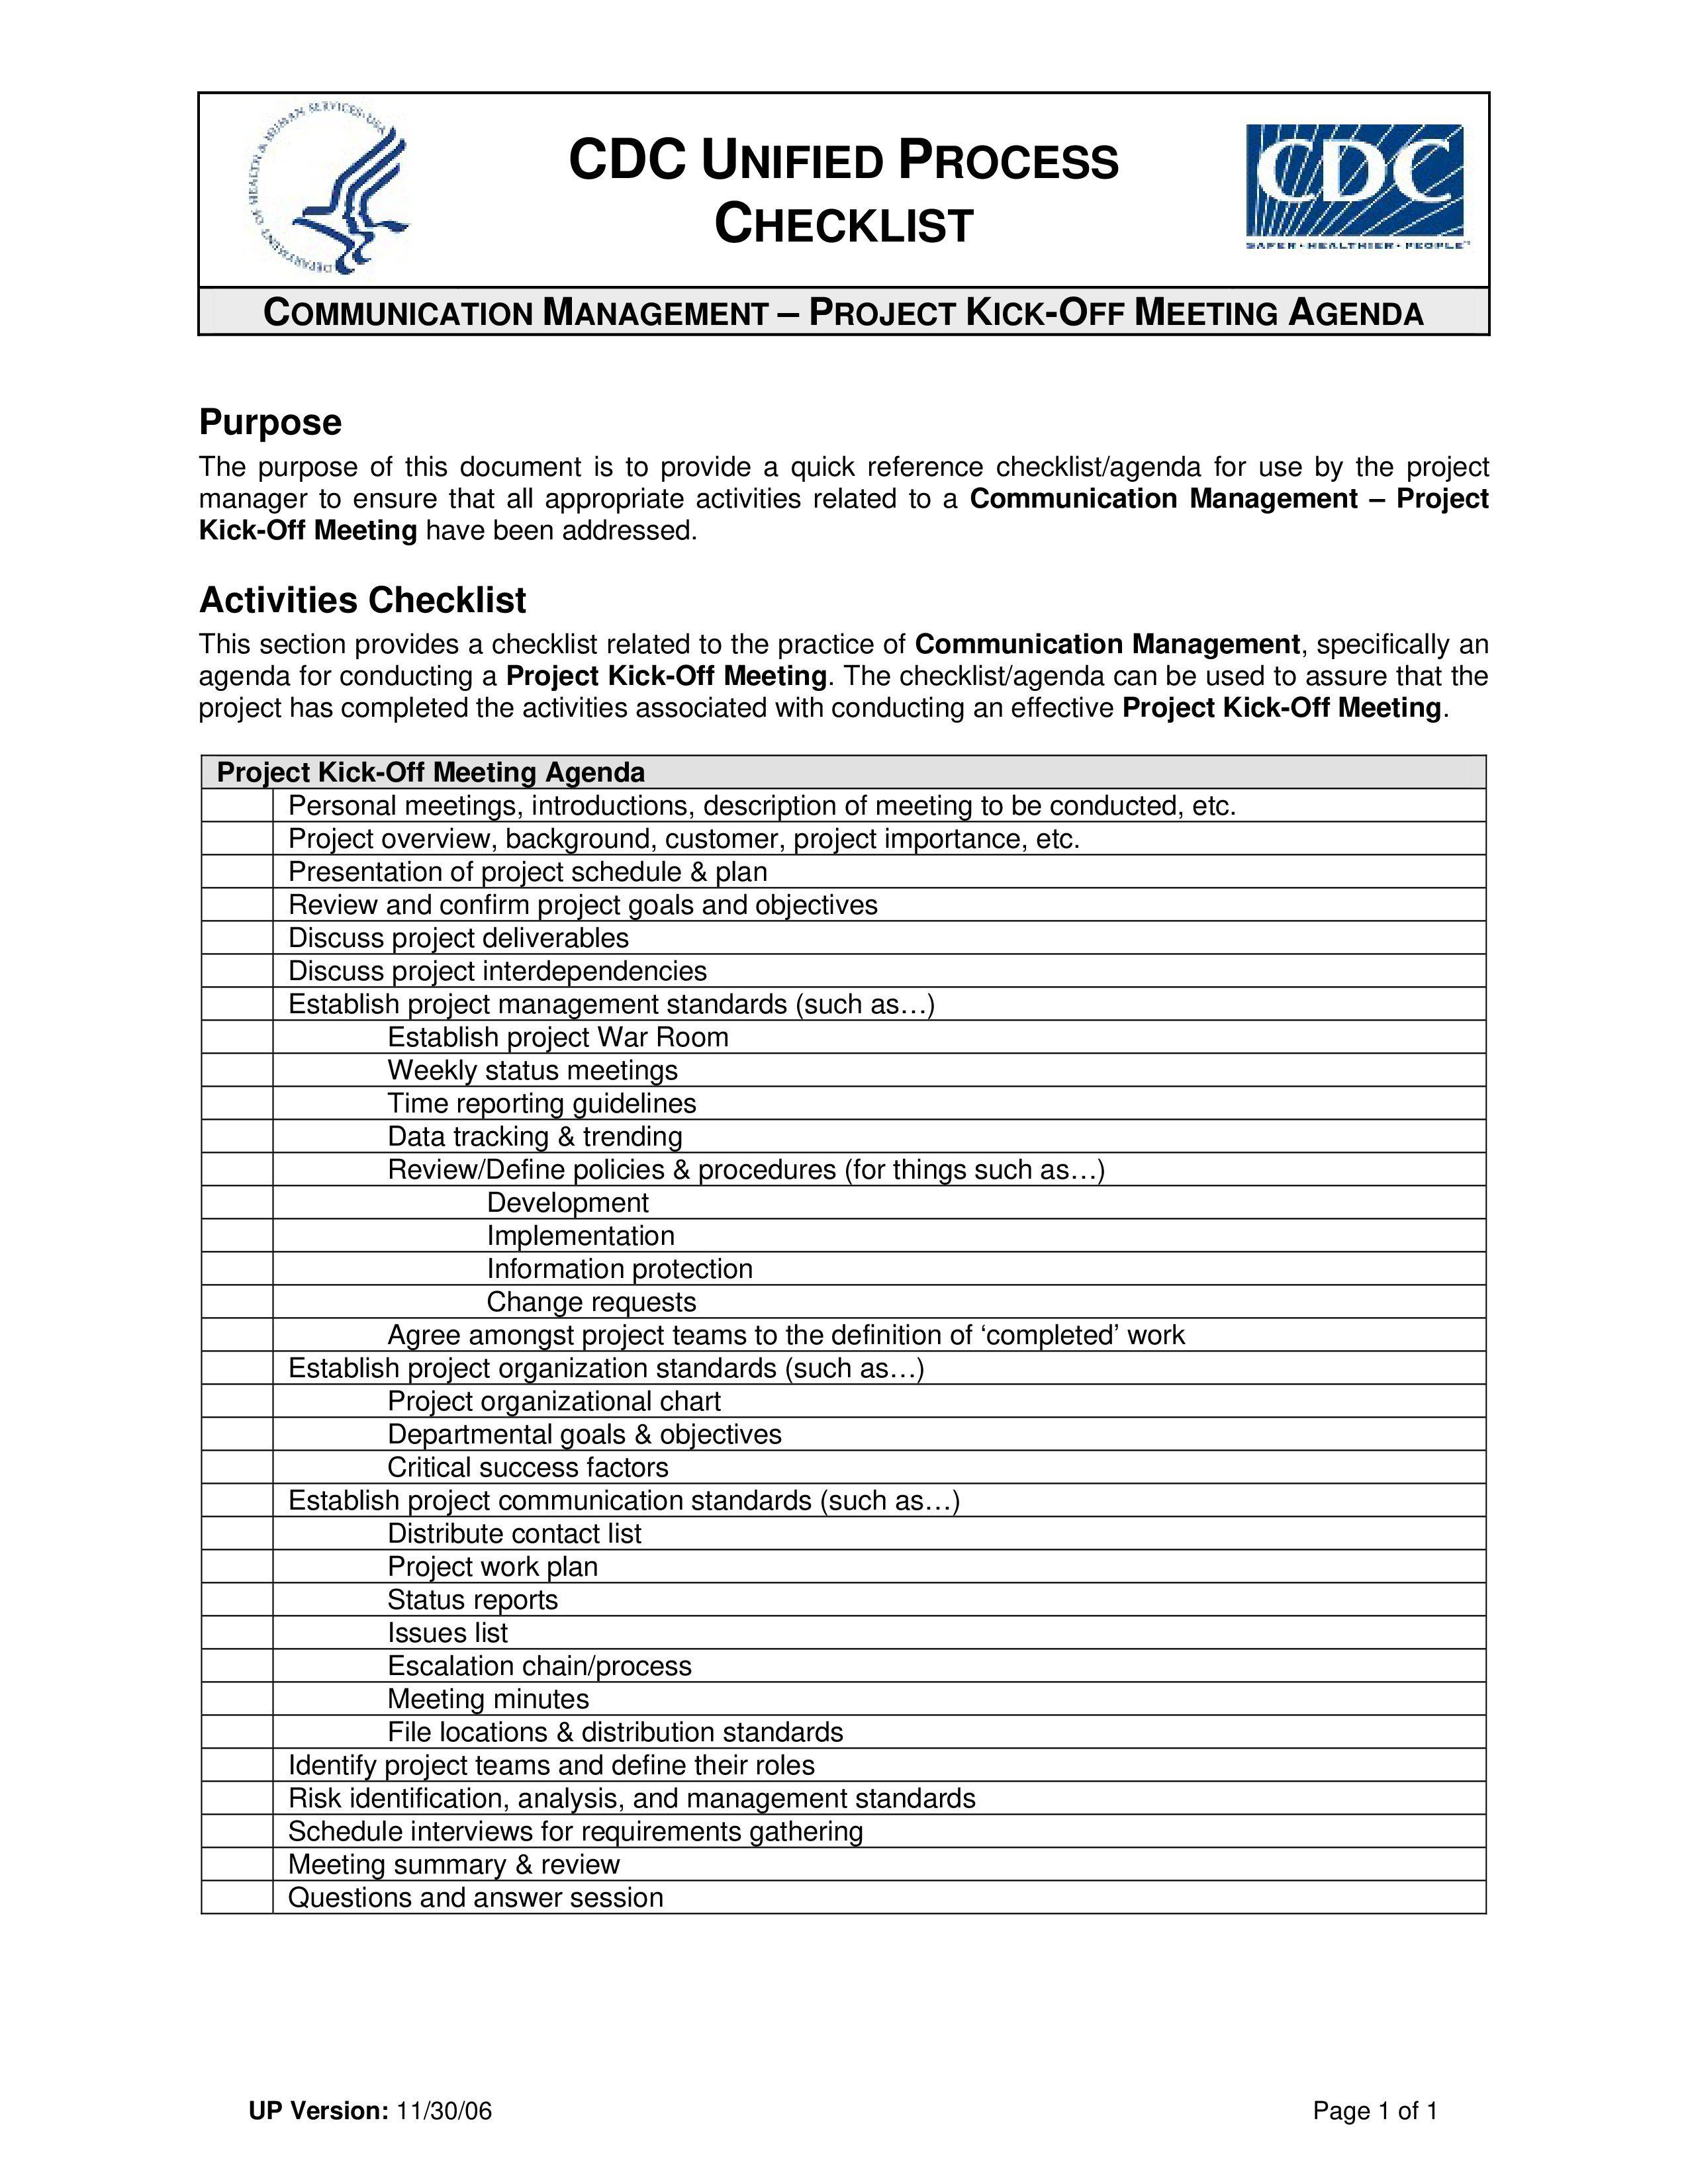 002 Beautiful Kick Off Meeting Template Image  Invitation Email Agenda Project ManagementFull